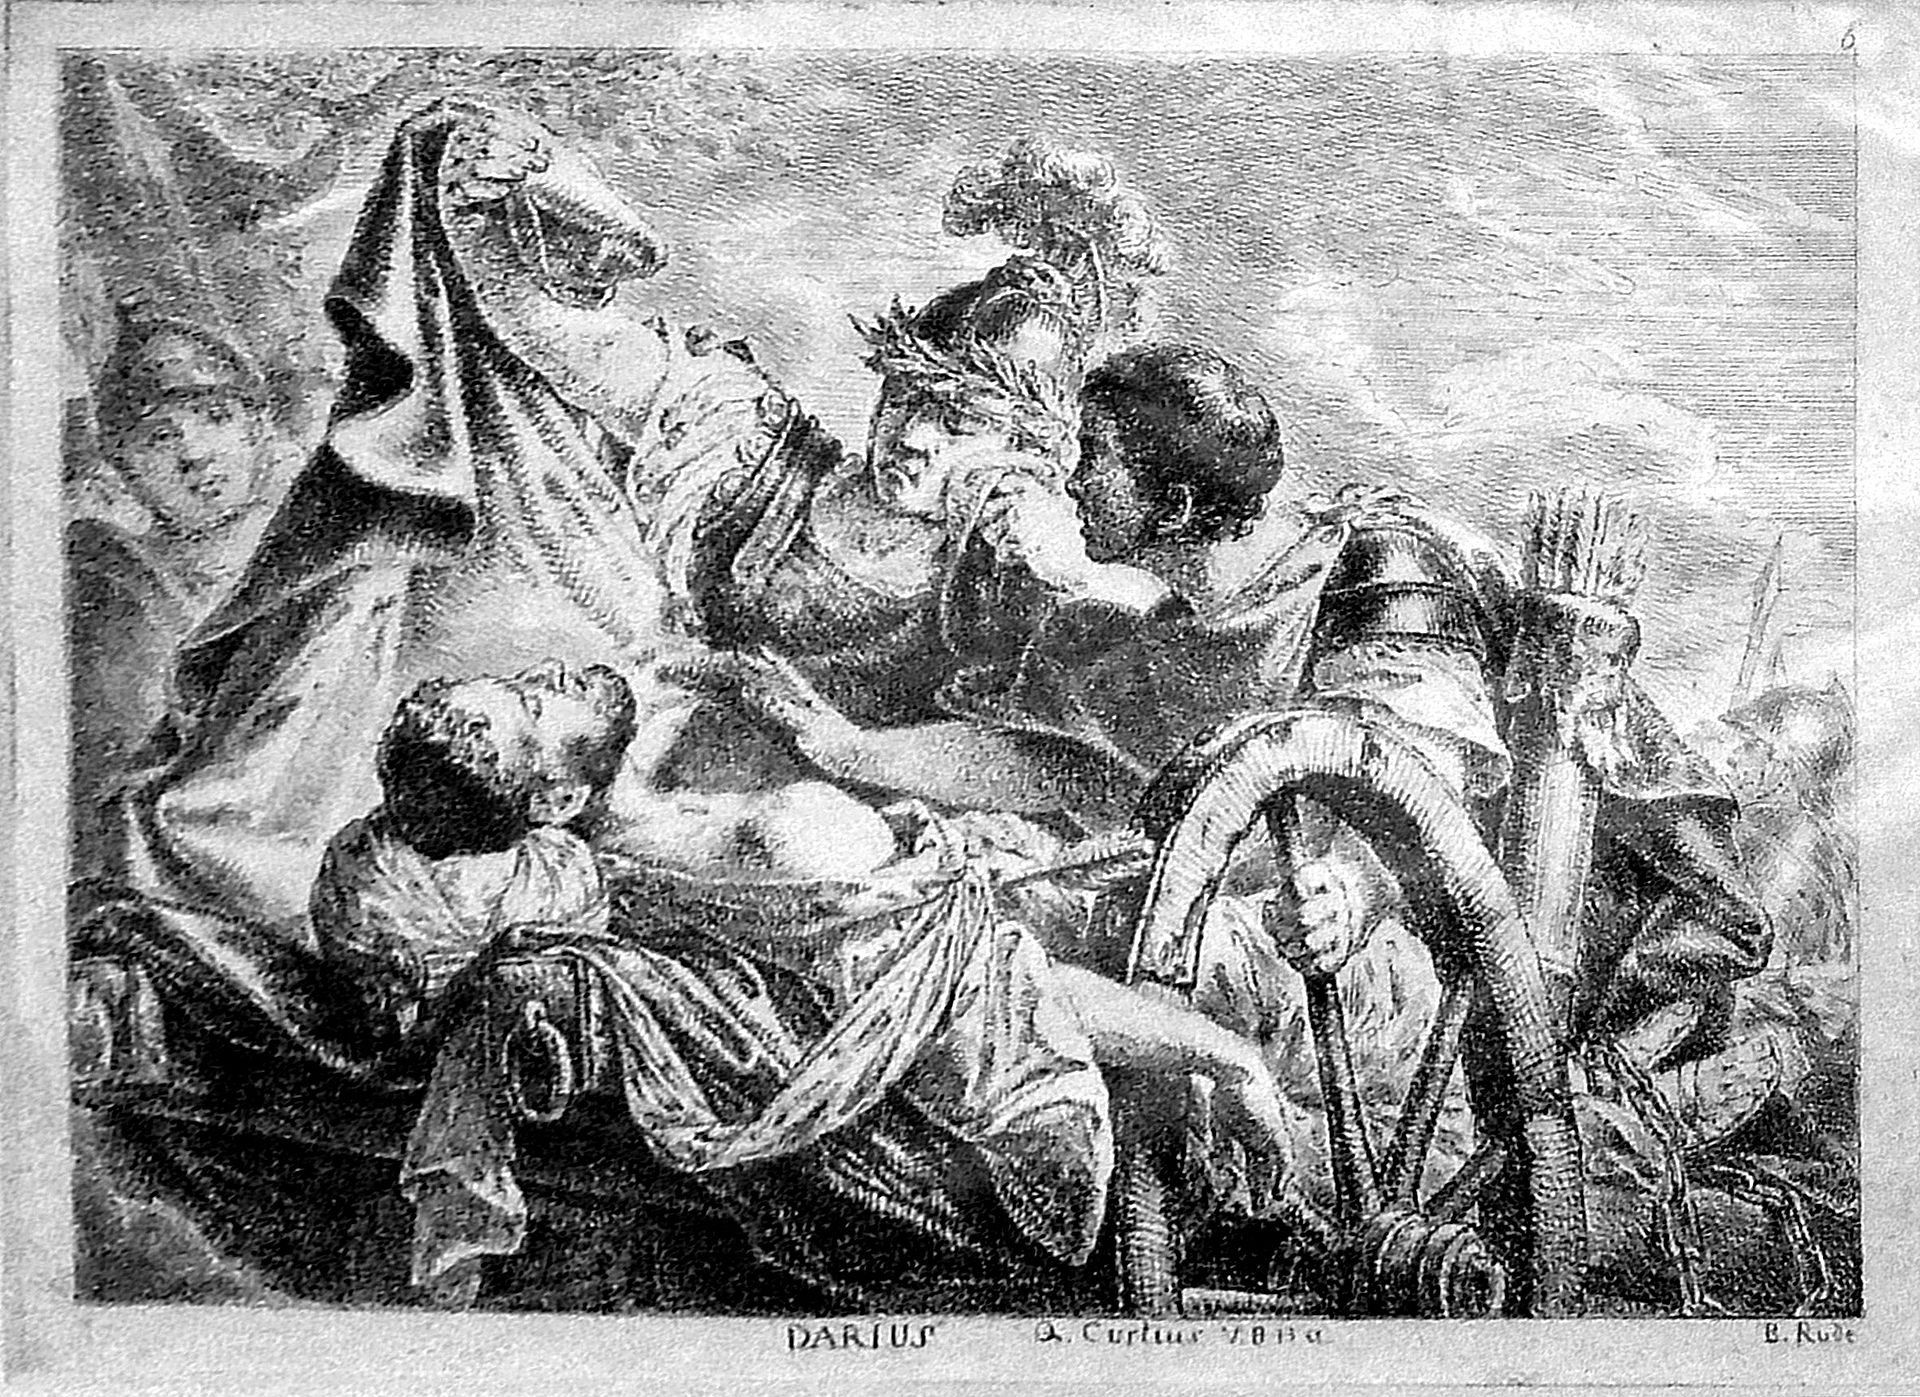 Death of Darius with dog